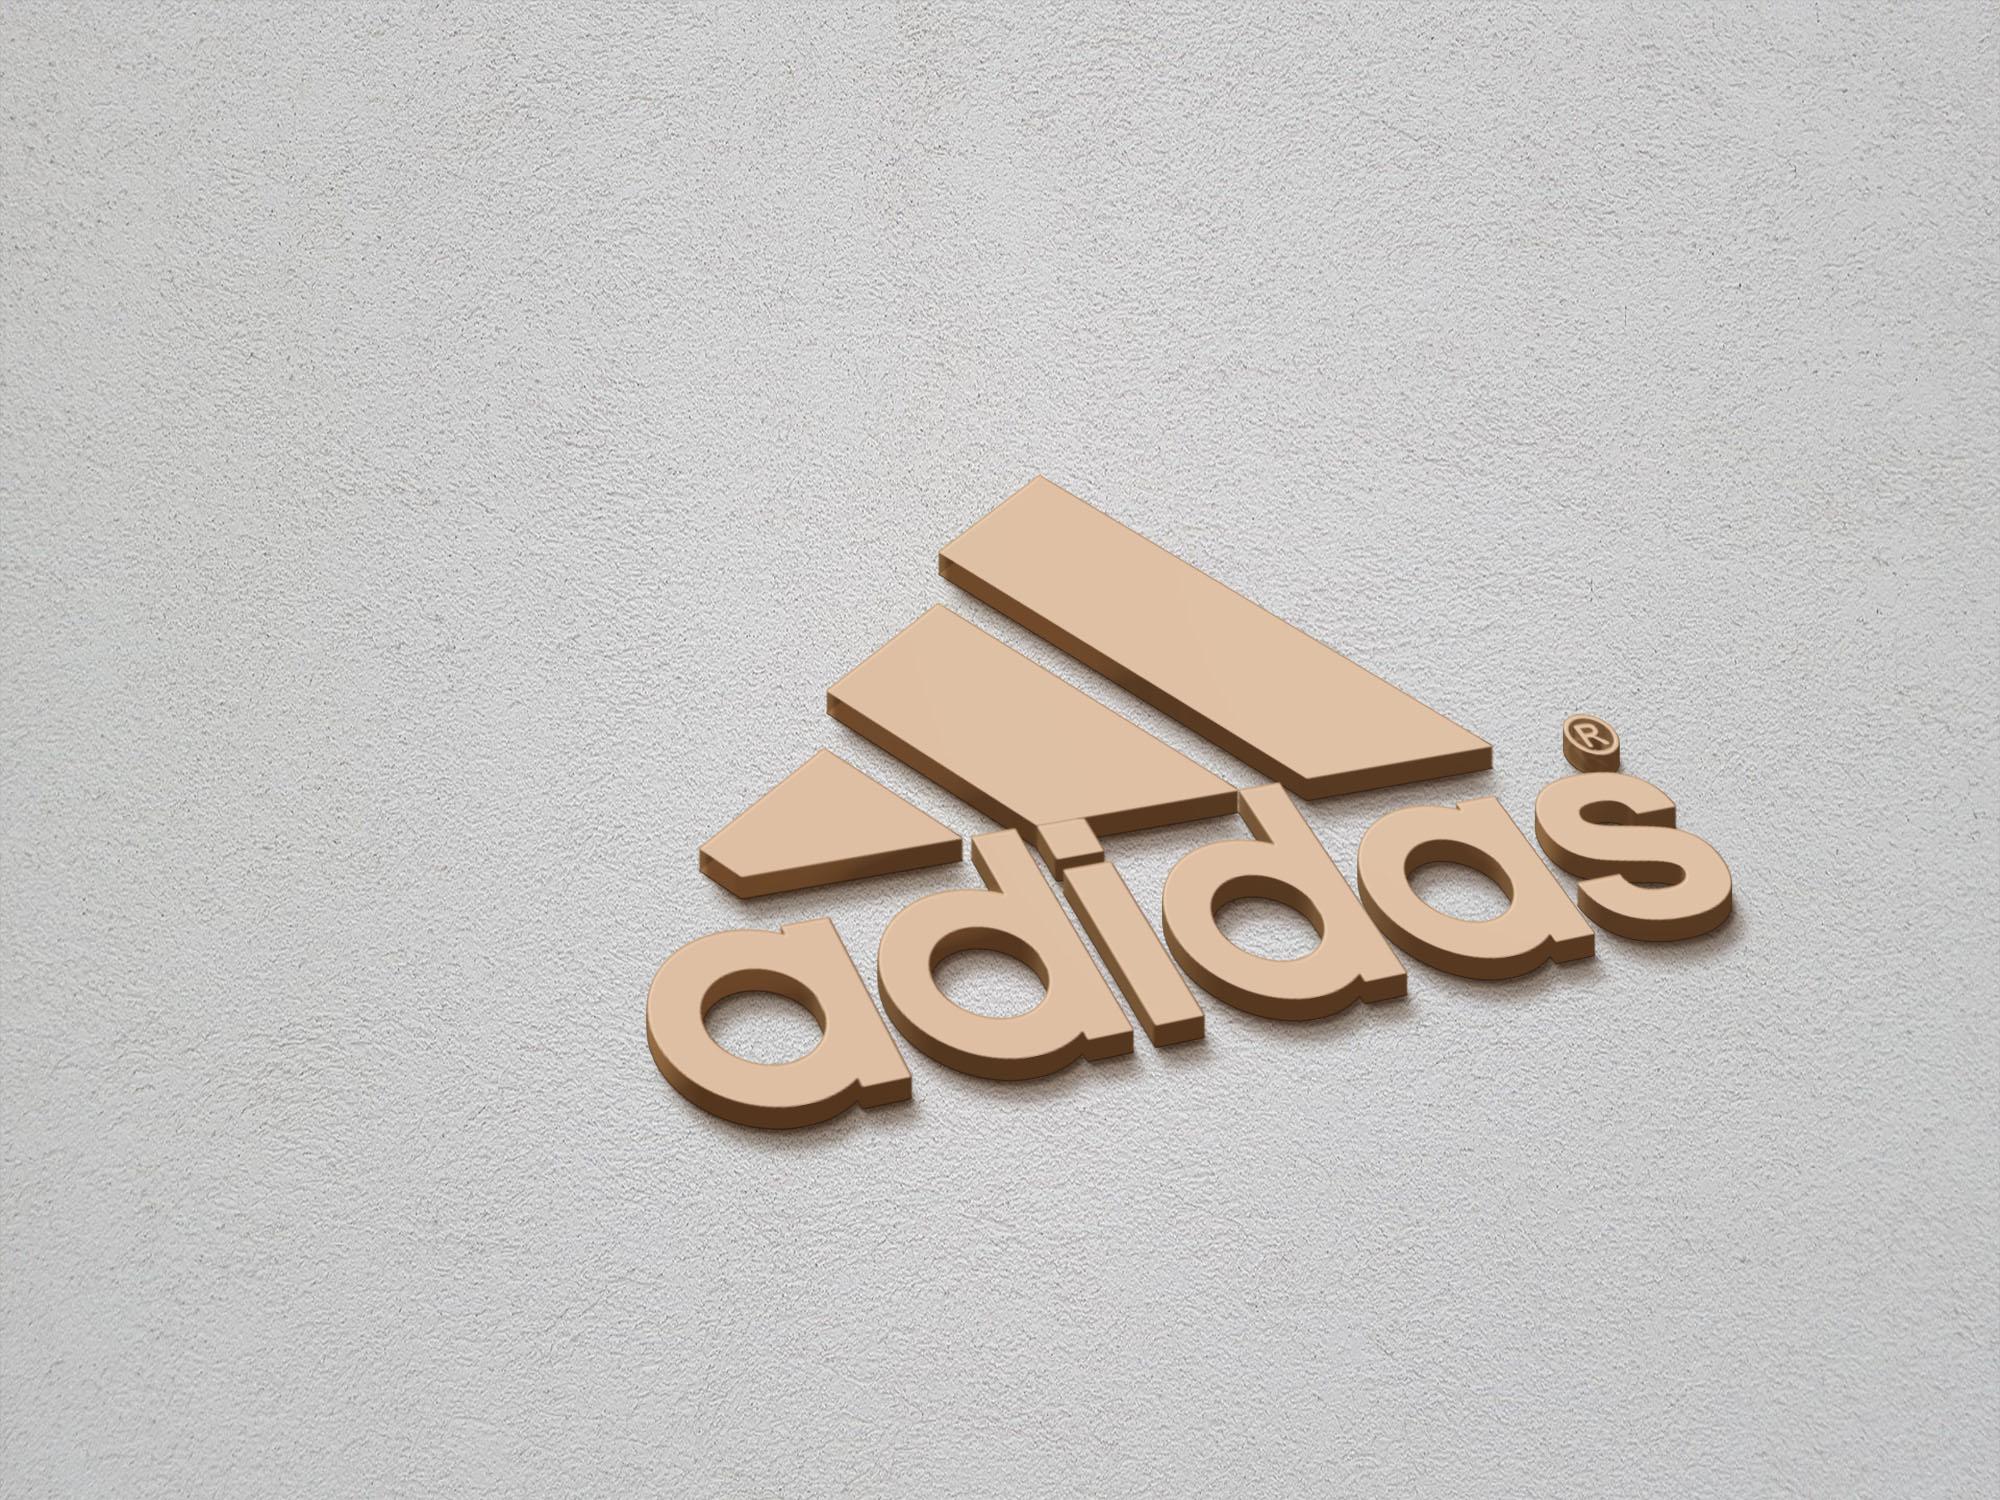 Adidas logo on 3d gold mockup